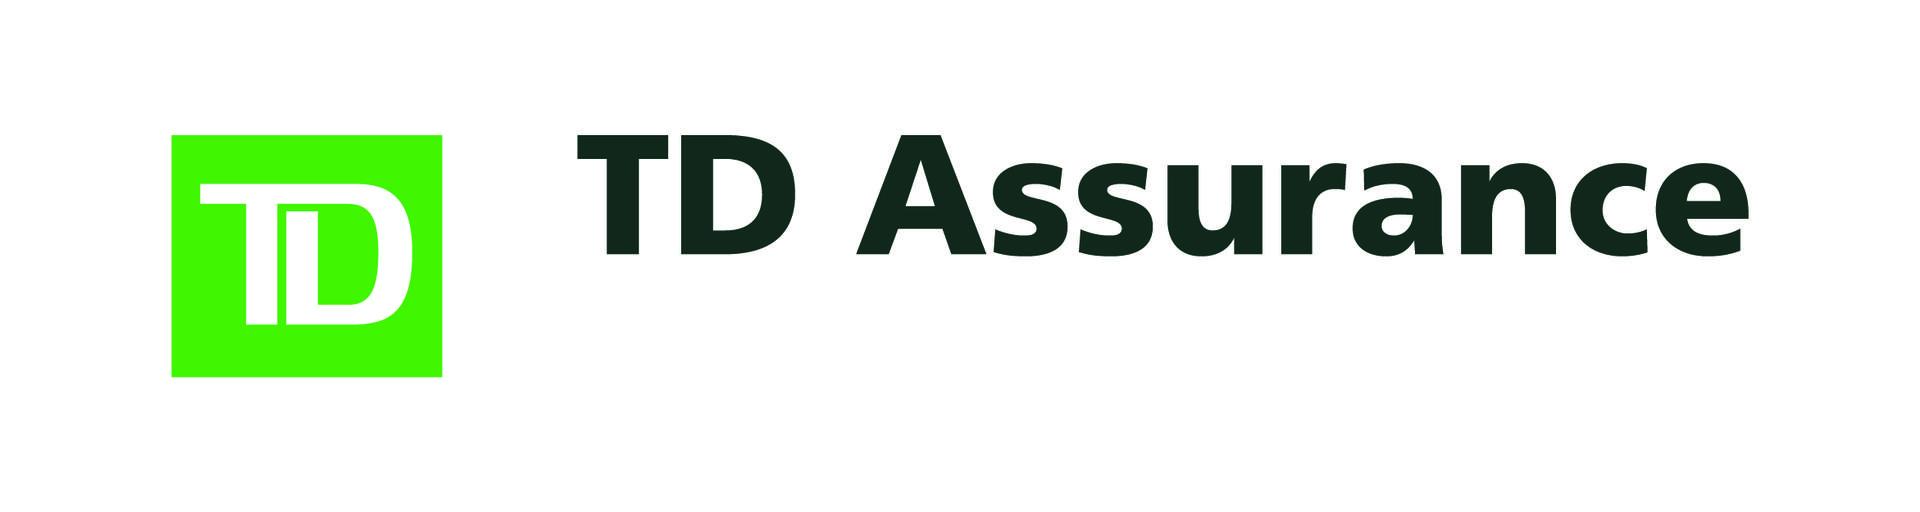 Logo TD Assurance